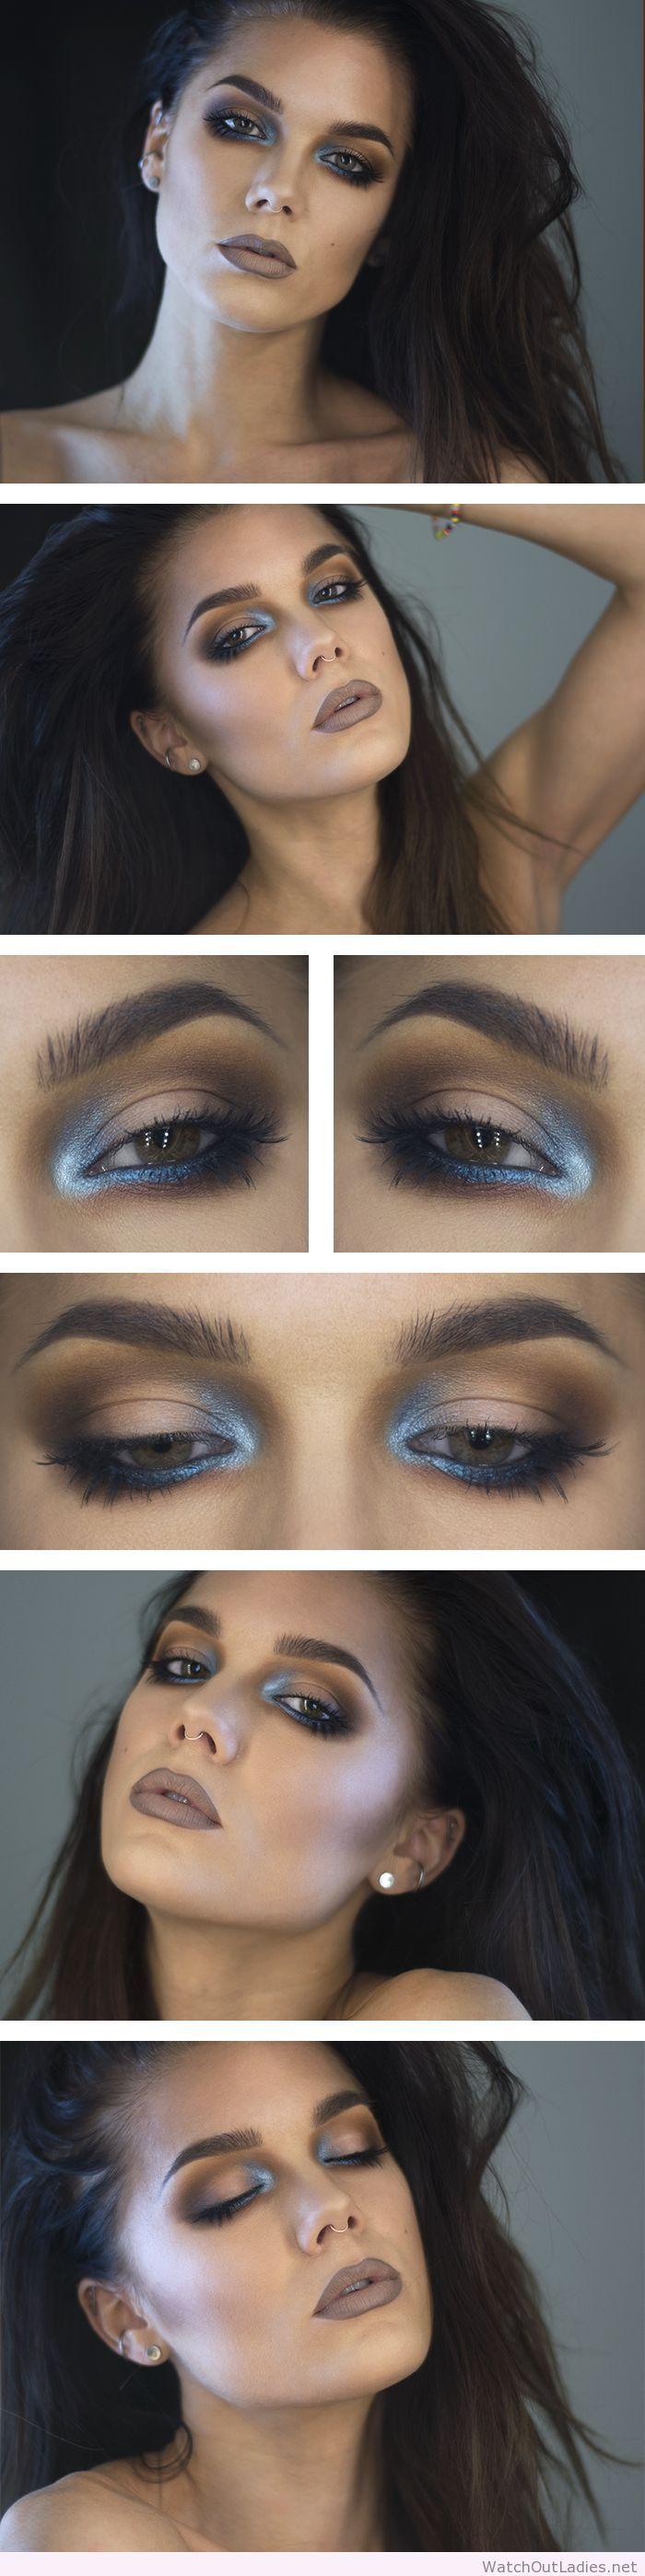 Linda Hallberg dark makeup and blue accent